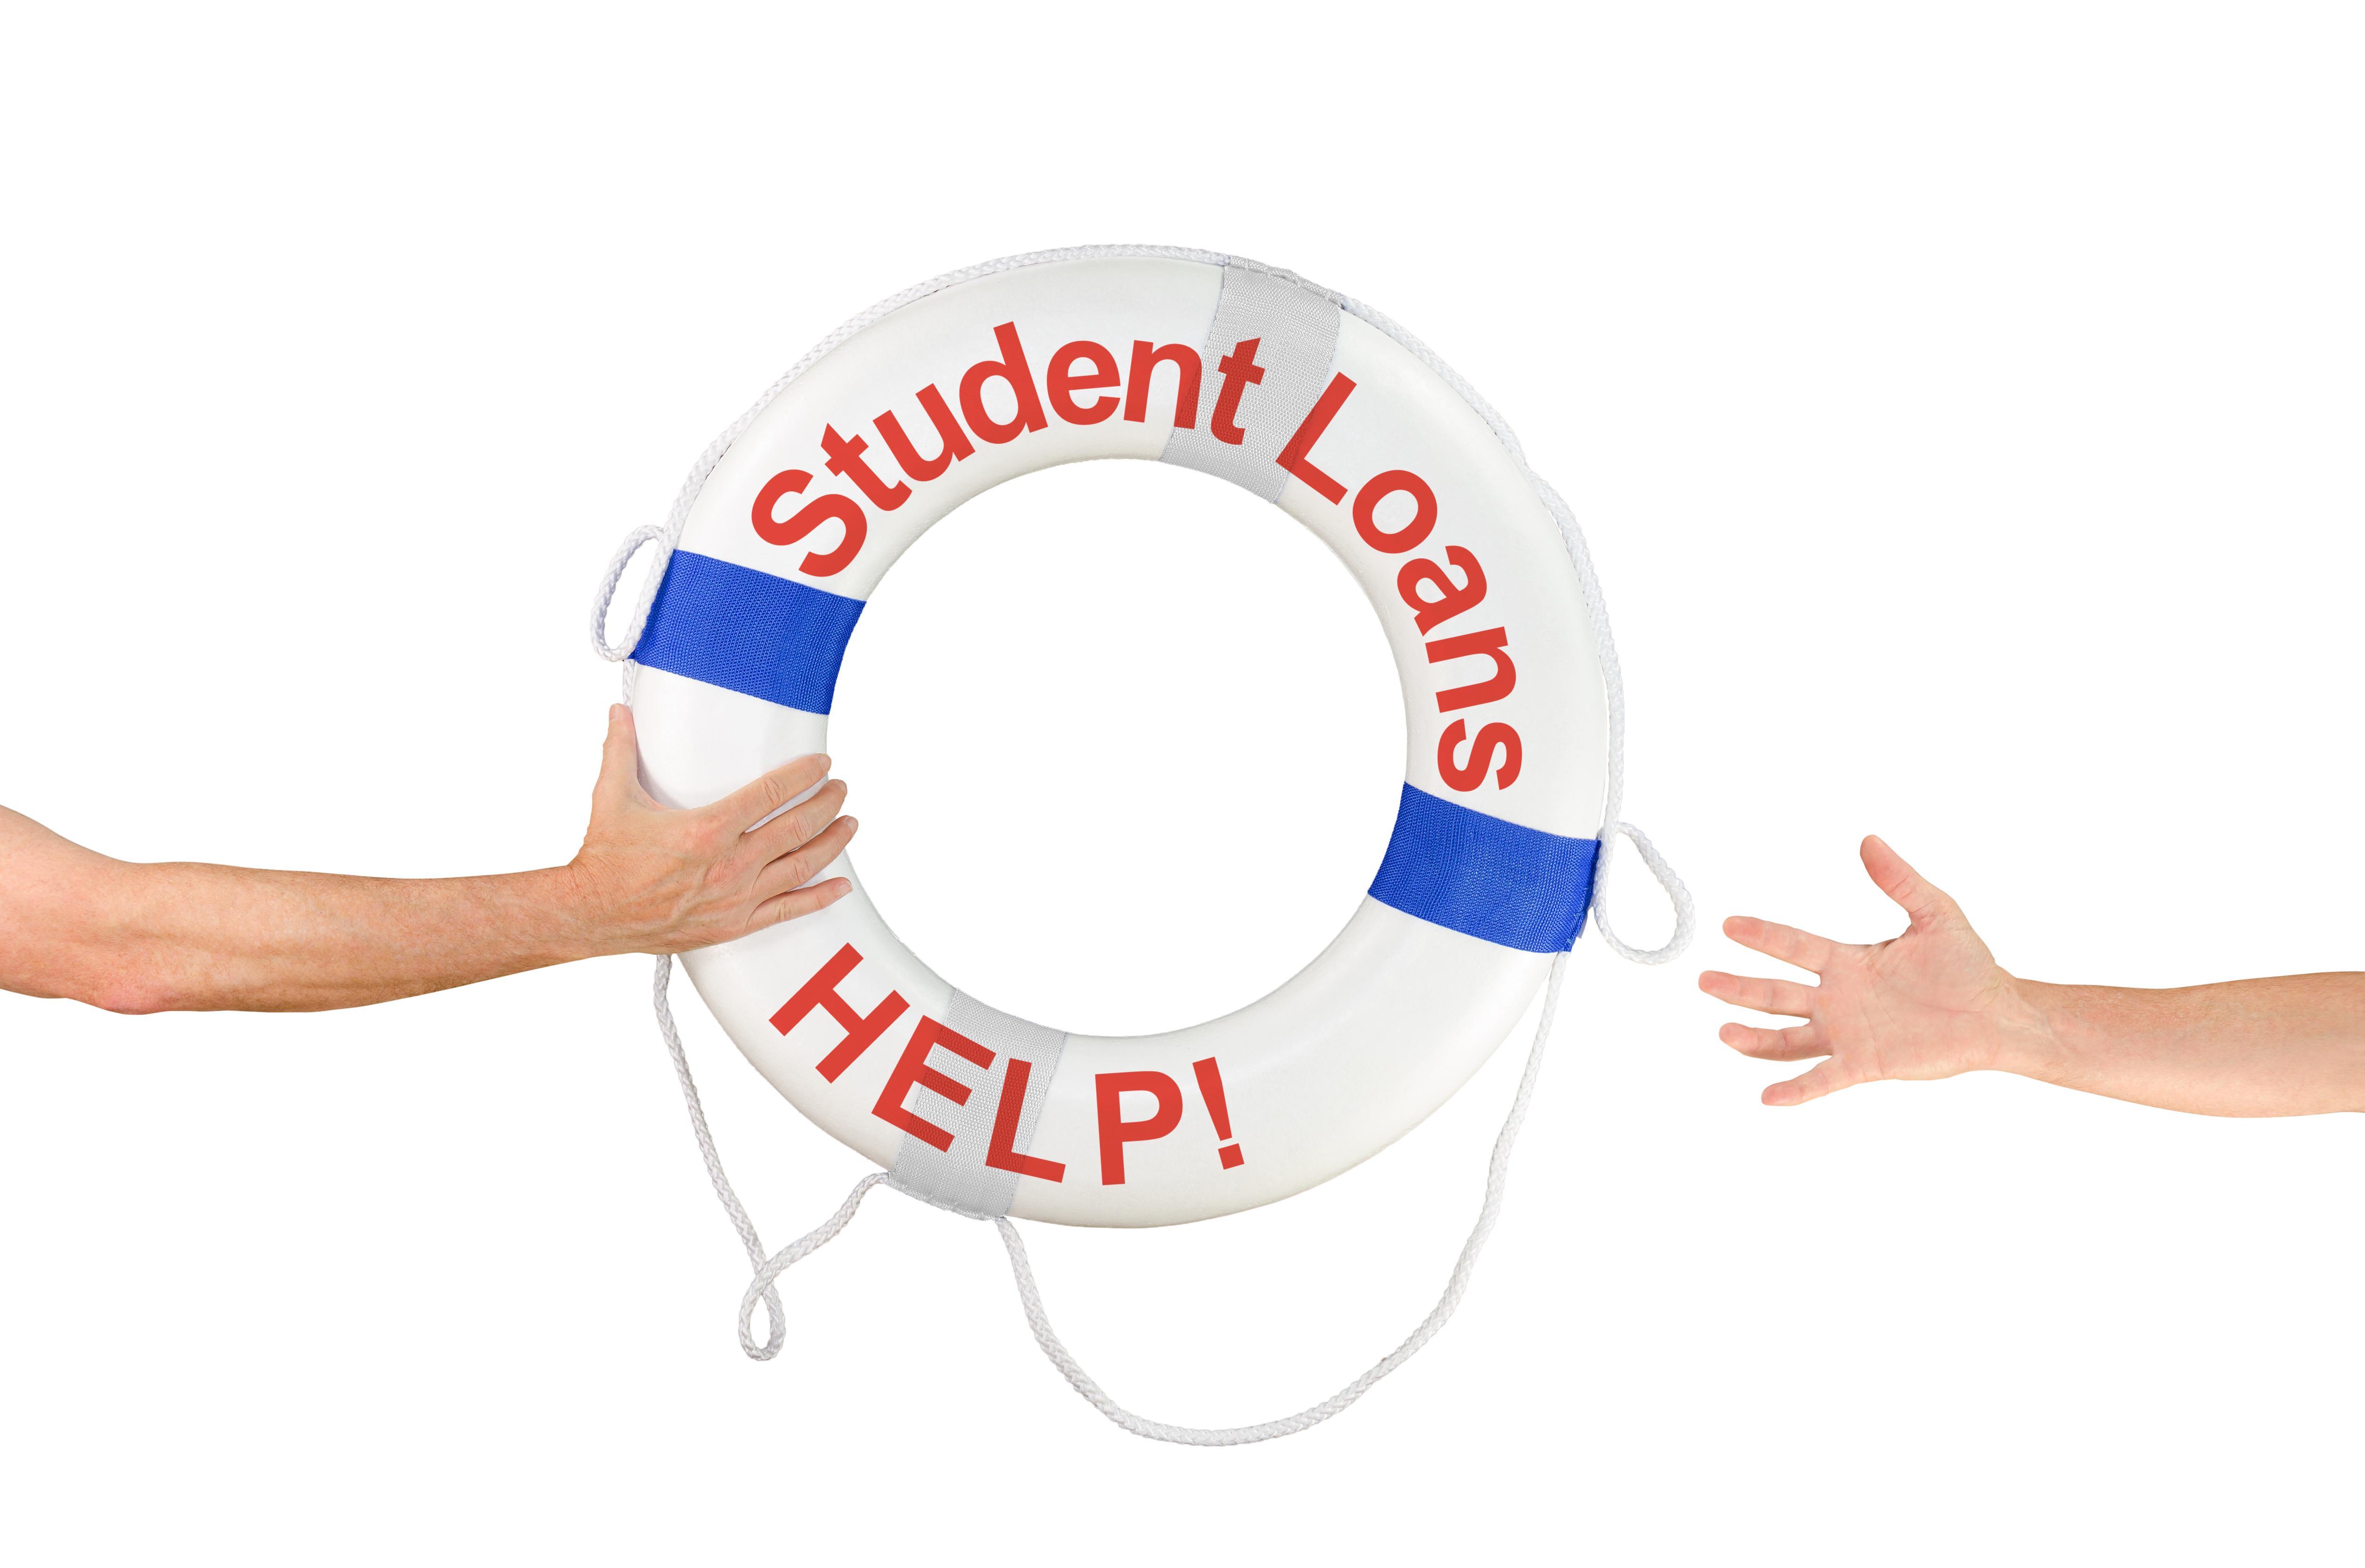 Effective Student Loan Repayment Strategies Thumbnail